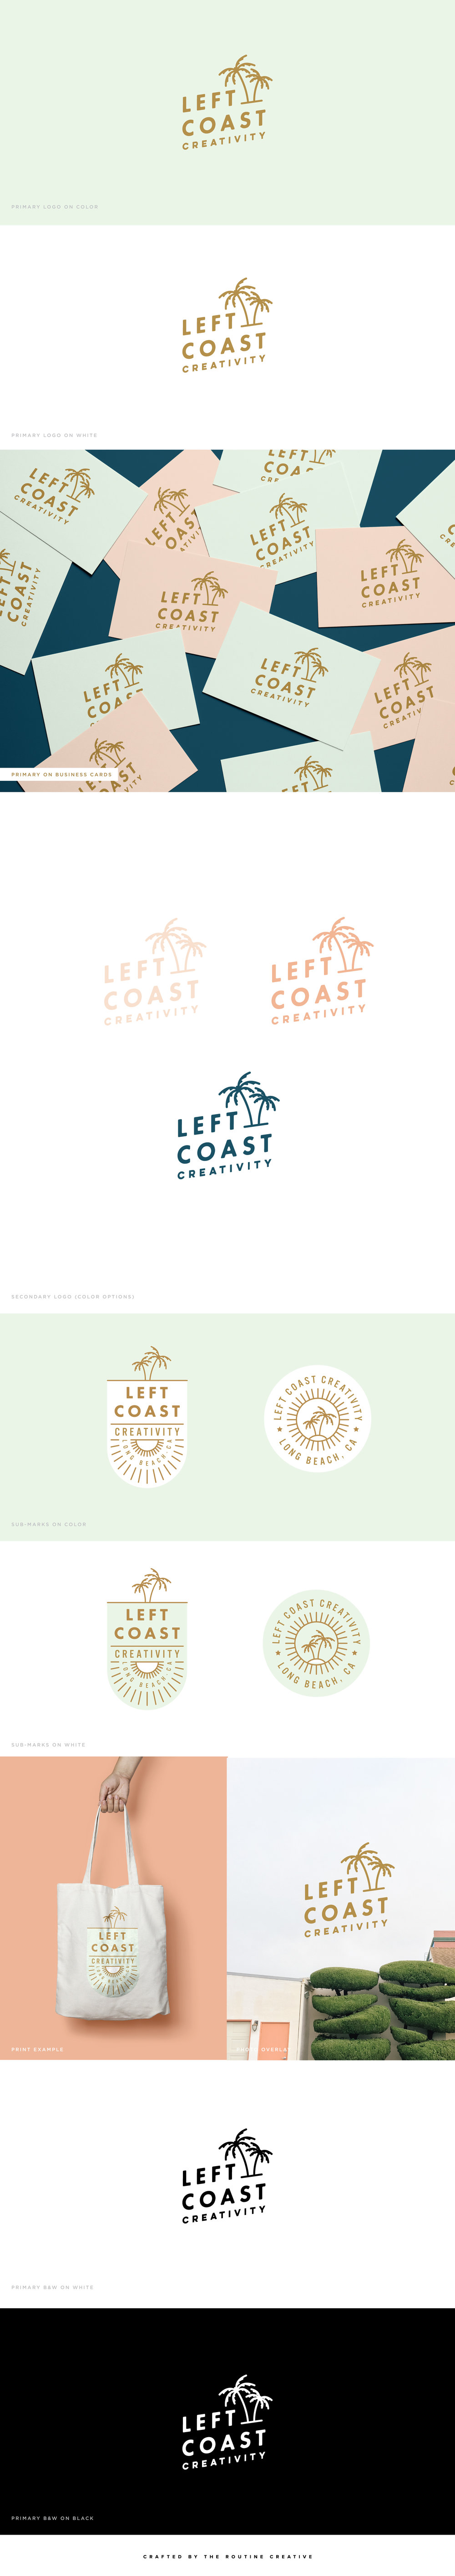 Left-Coast-Concept-1.jpg